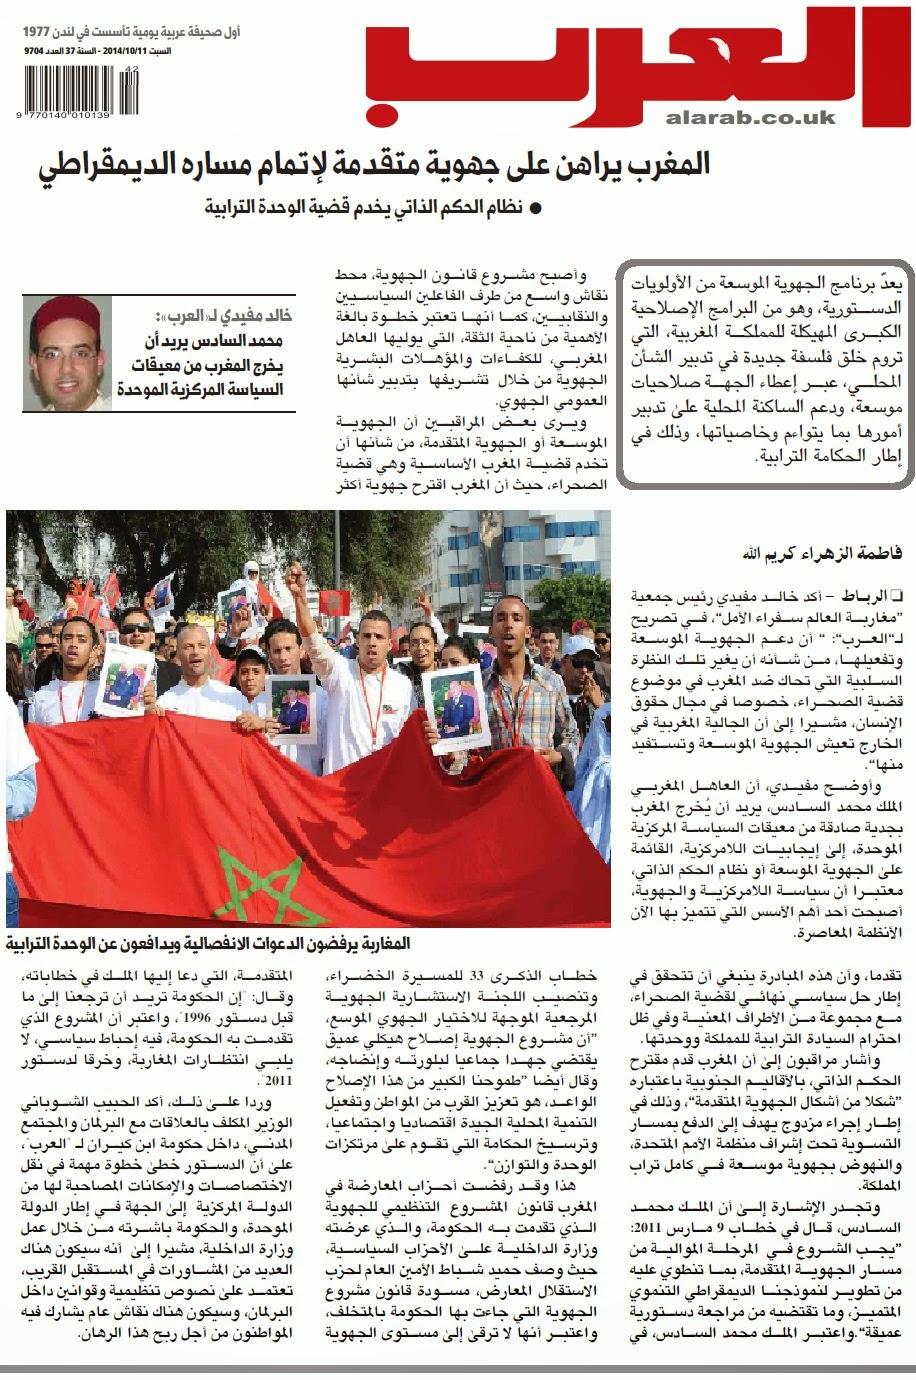 "khalid moufidi خالد مفيدي لـ""العرب"": محمد السادس يريد أن يخرج المغرب من معيقات السياسة المركزية الموحدة"